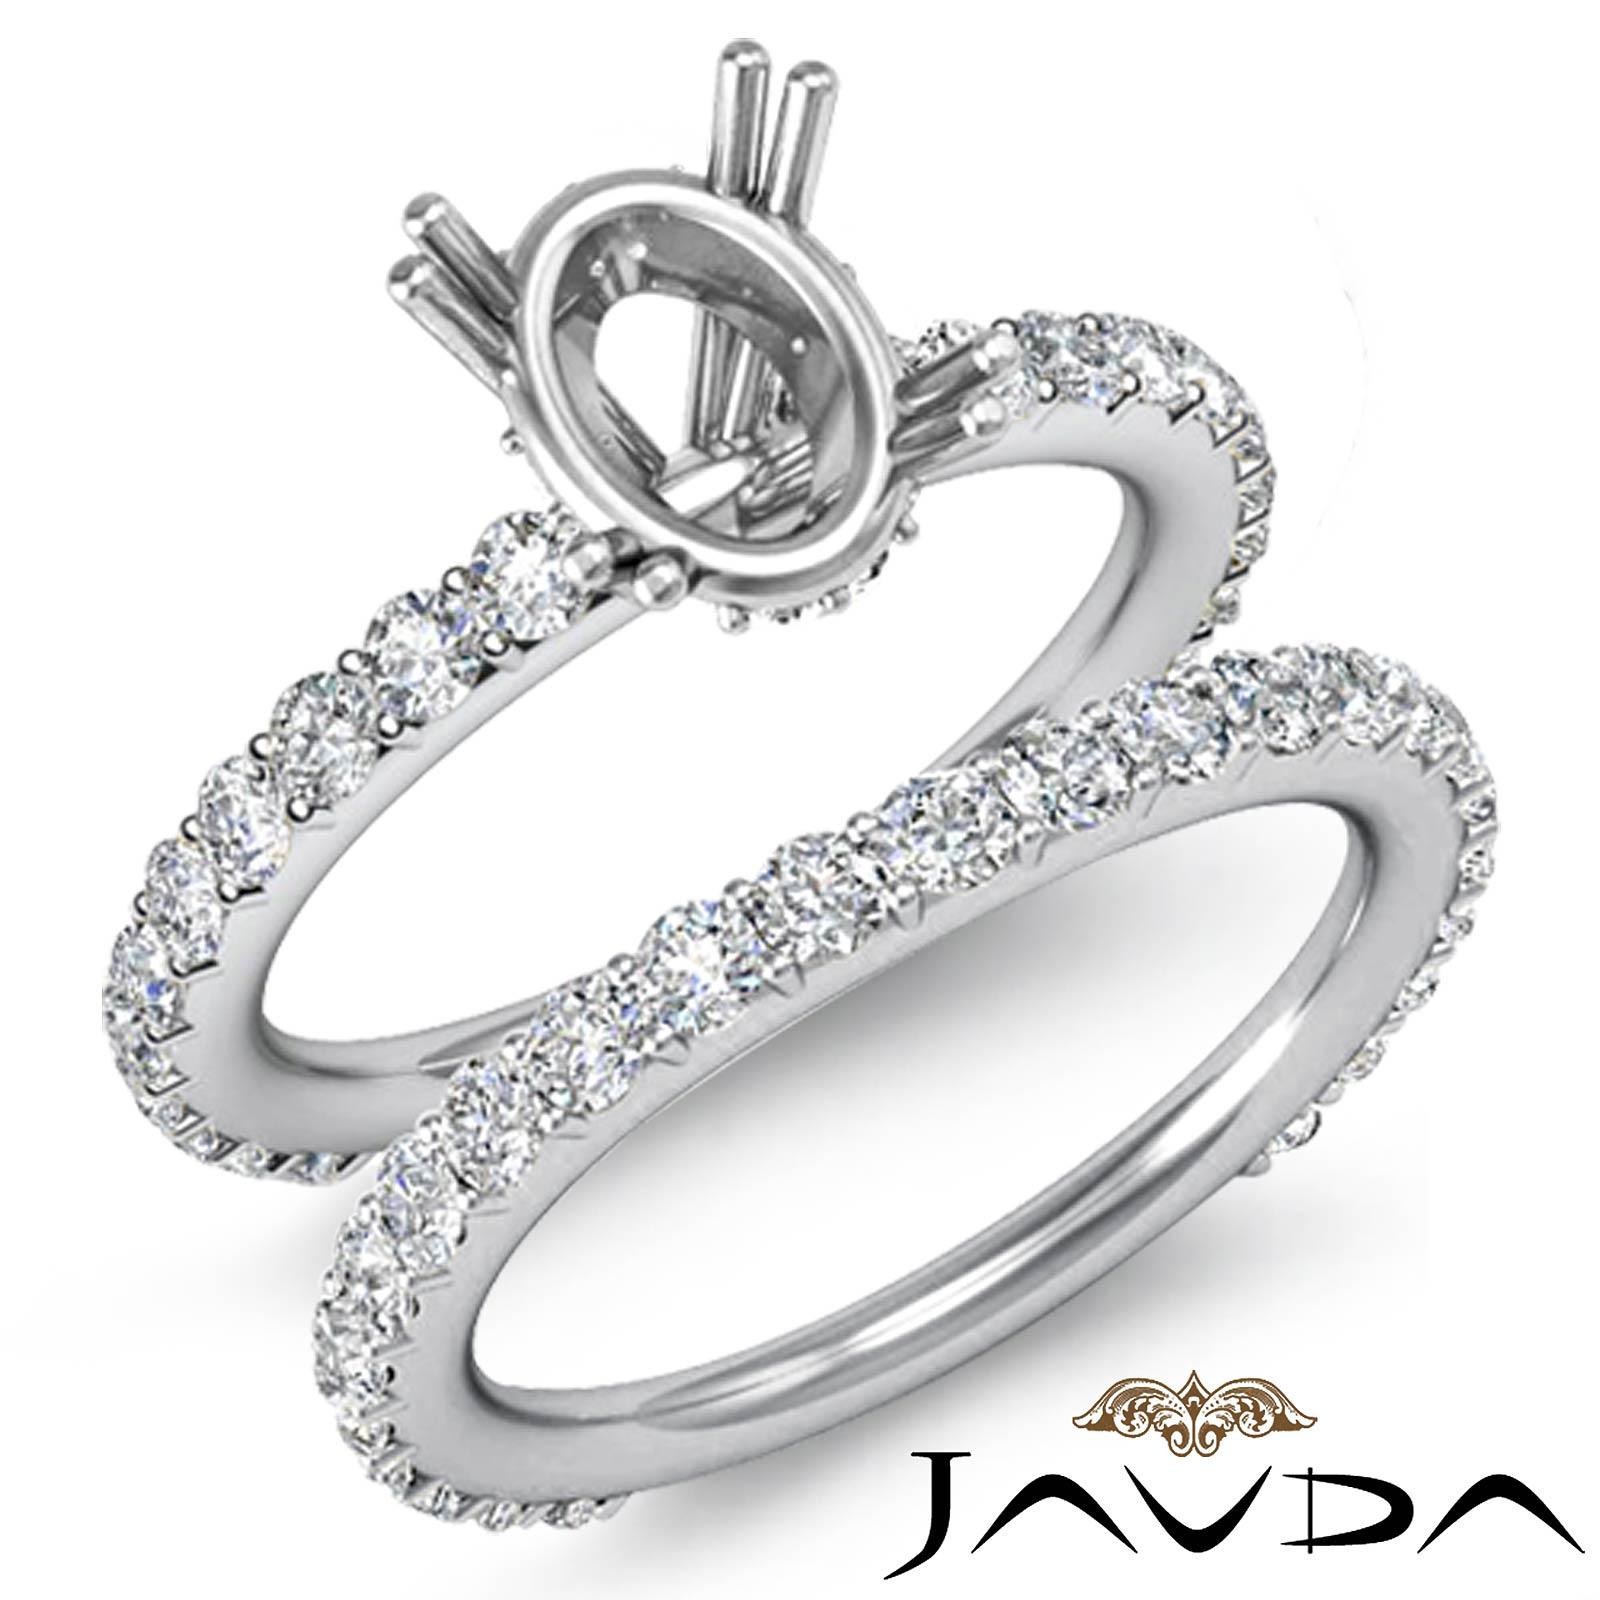 diamond engagement half eternity ring oval bridal settings. Black Bedroom Furniture Sets. Home Design Ideas